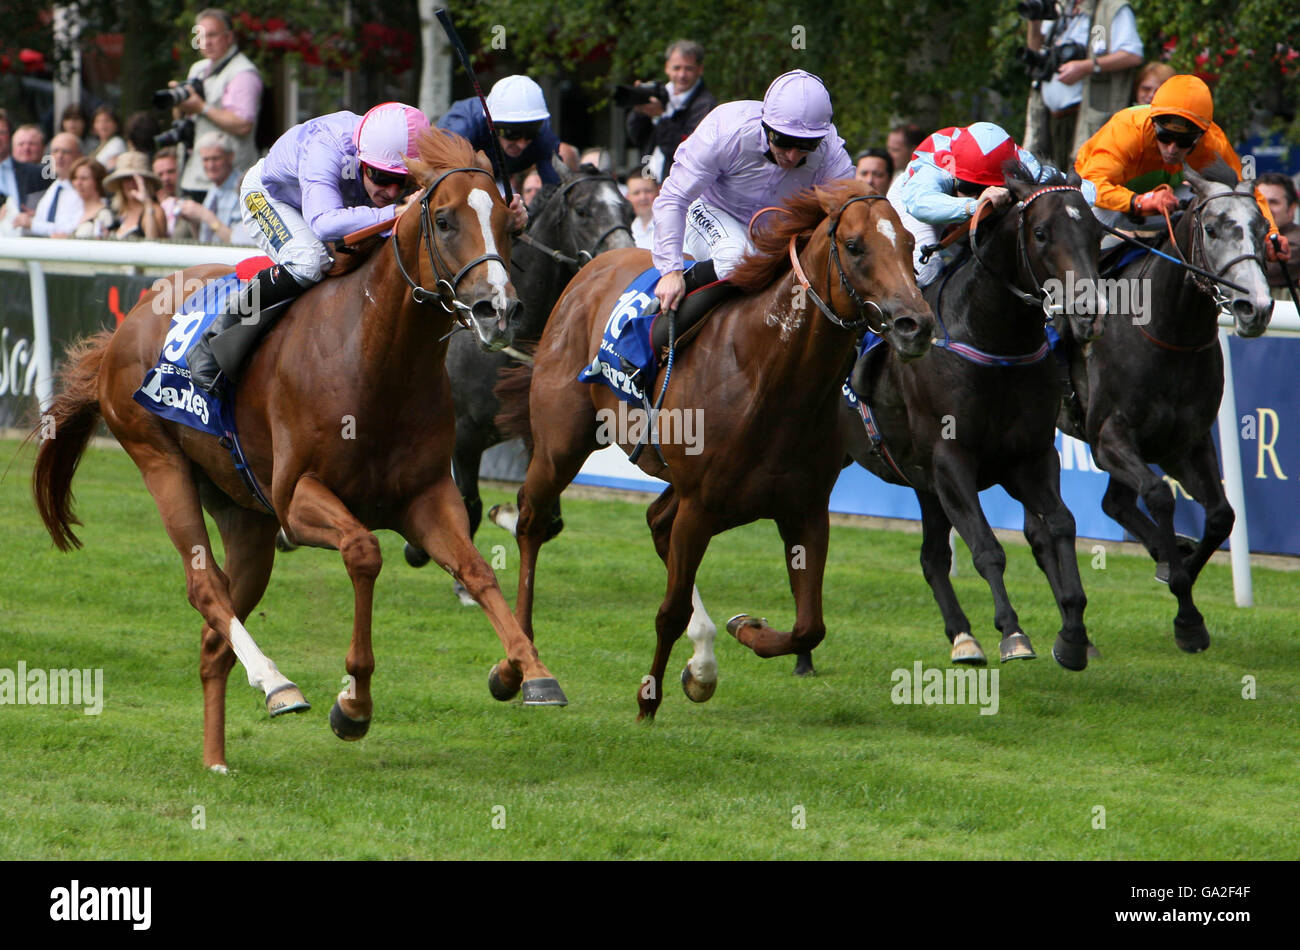 Sakhees Secret [1st left] and Jockey Steve Drowne win the Darley July Cup alongside Dutch Art and Jockey Jimmy Fortune Stock Photo